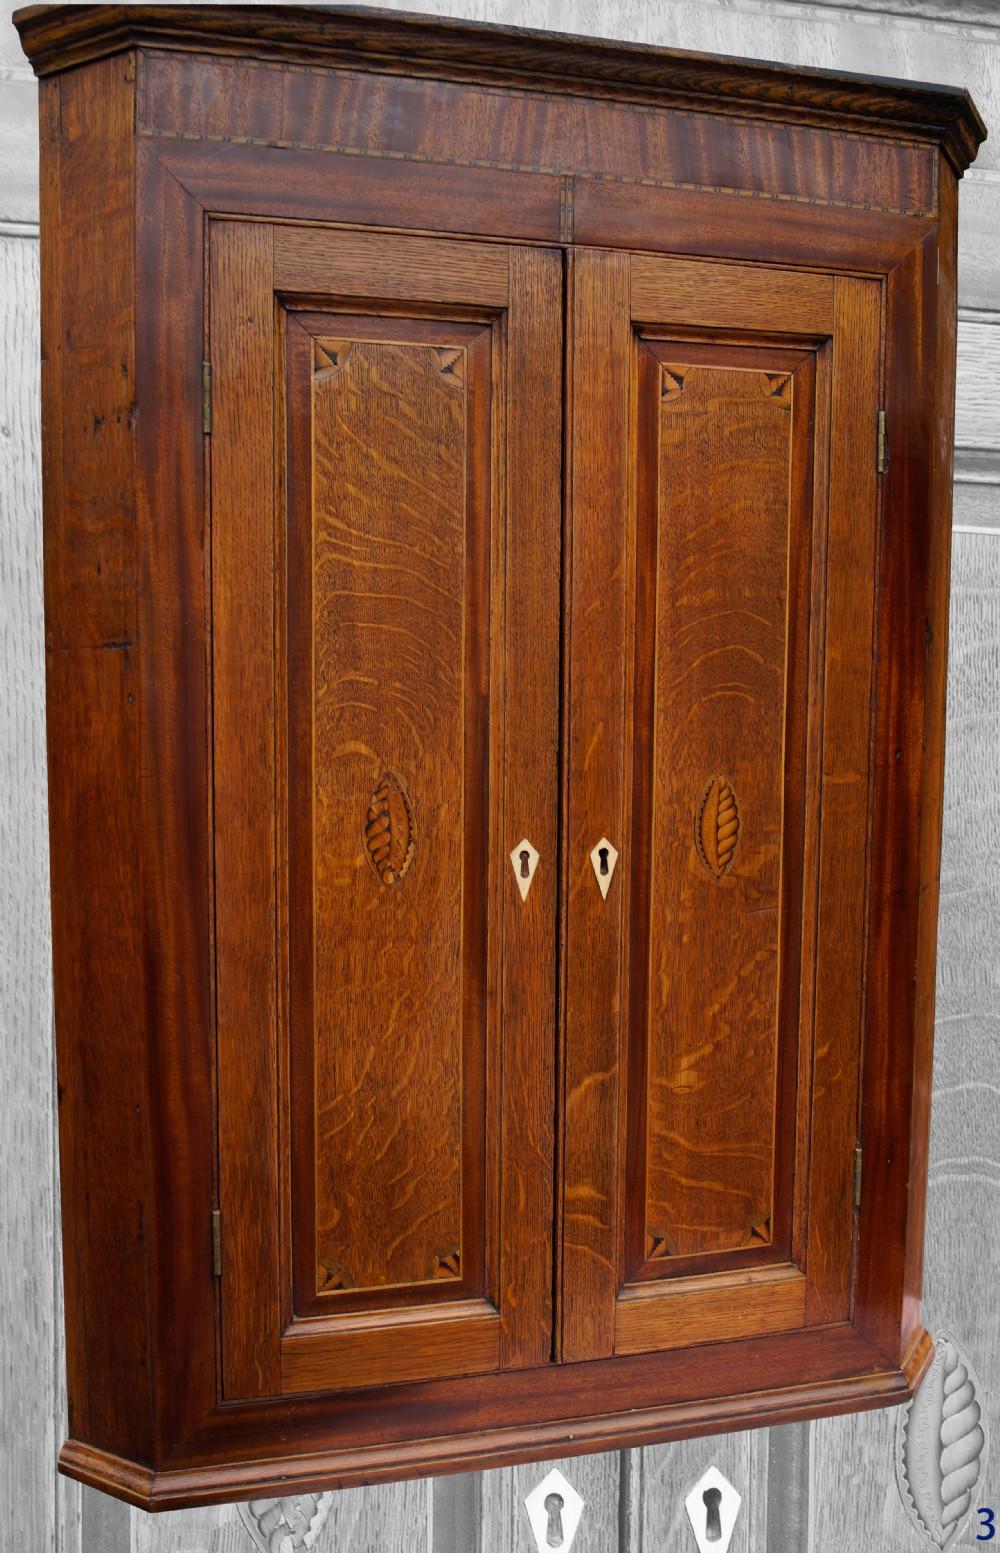 oak and mahogany collector's cupboard circa 1810